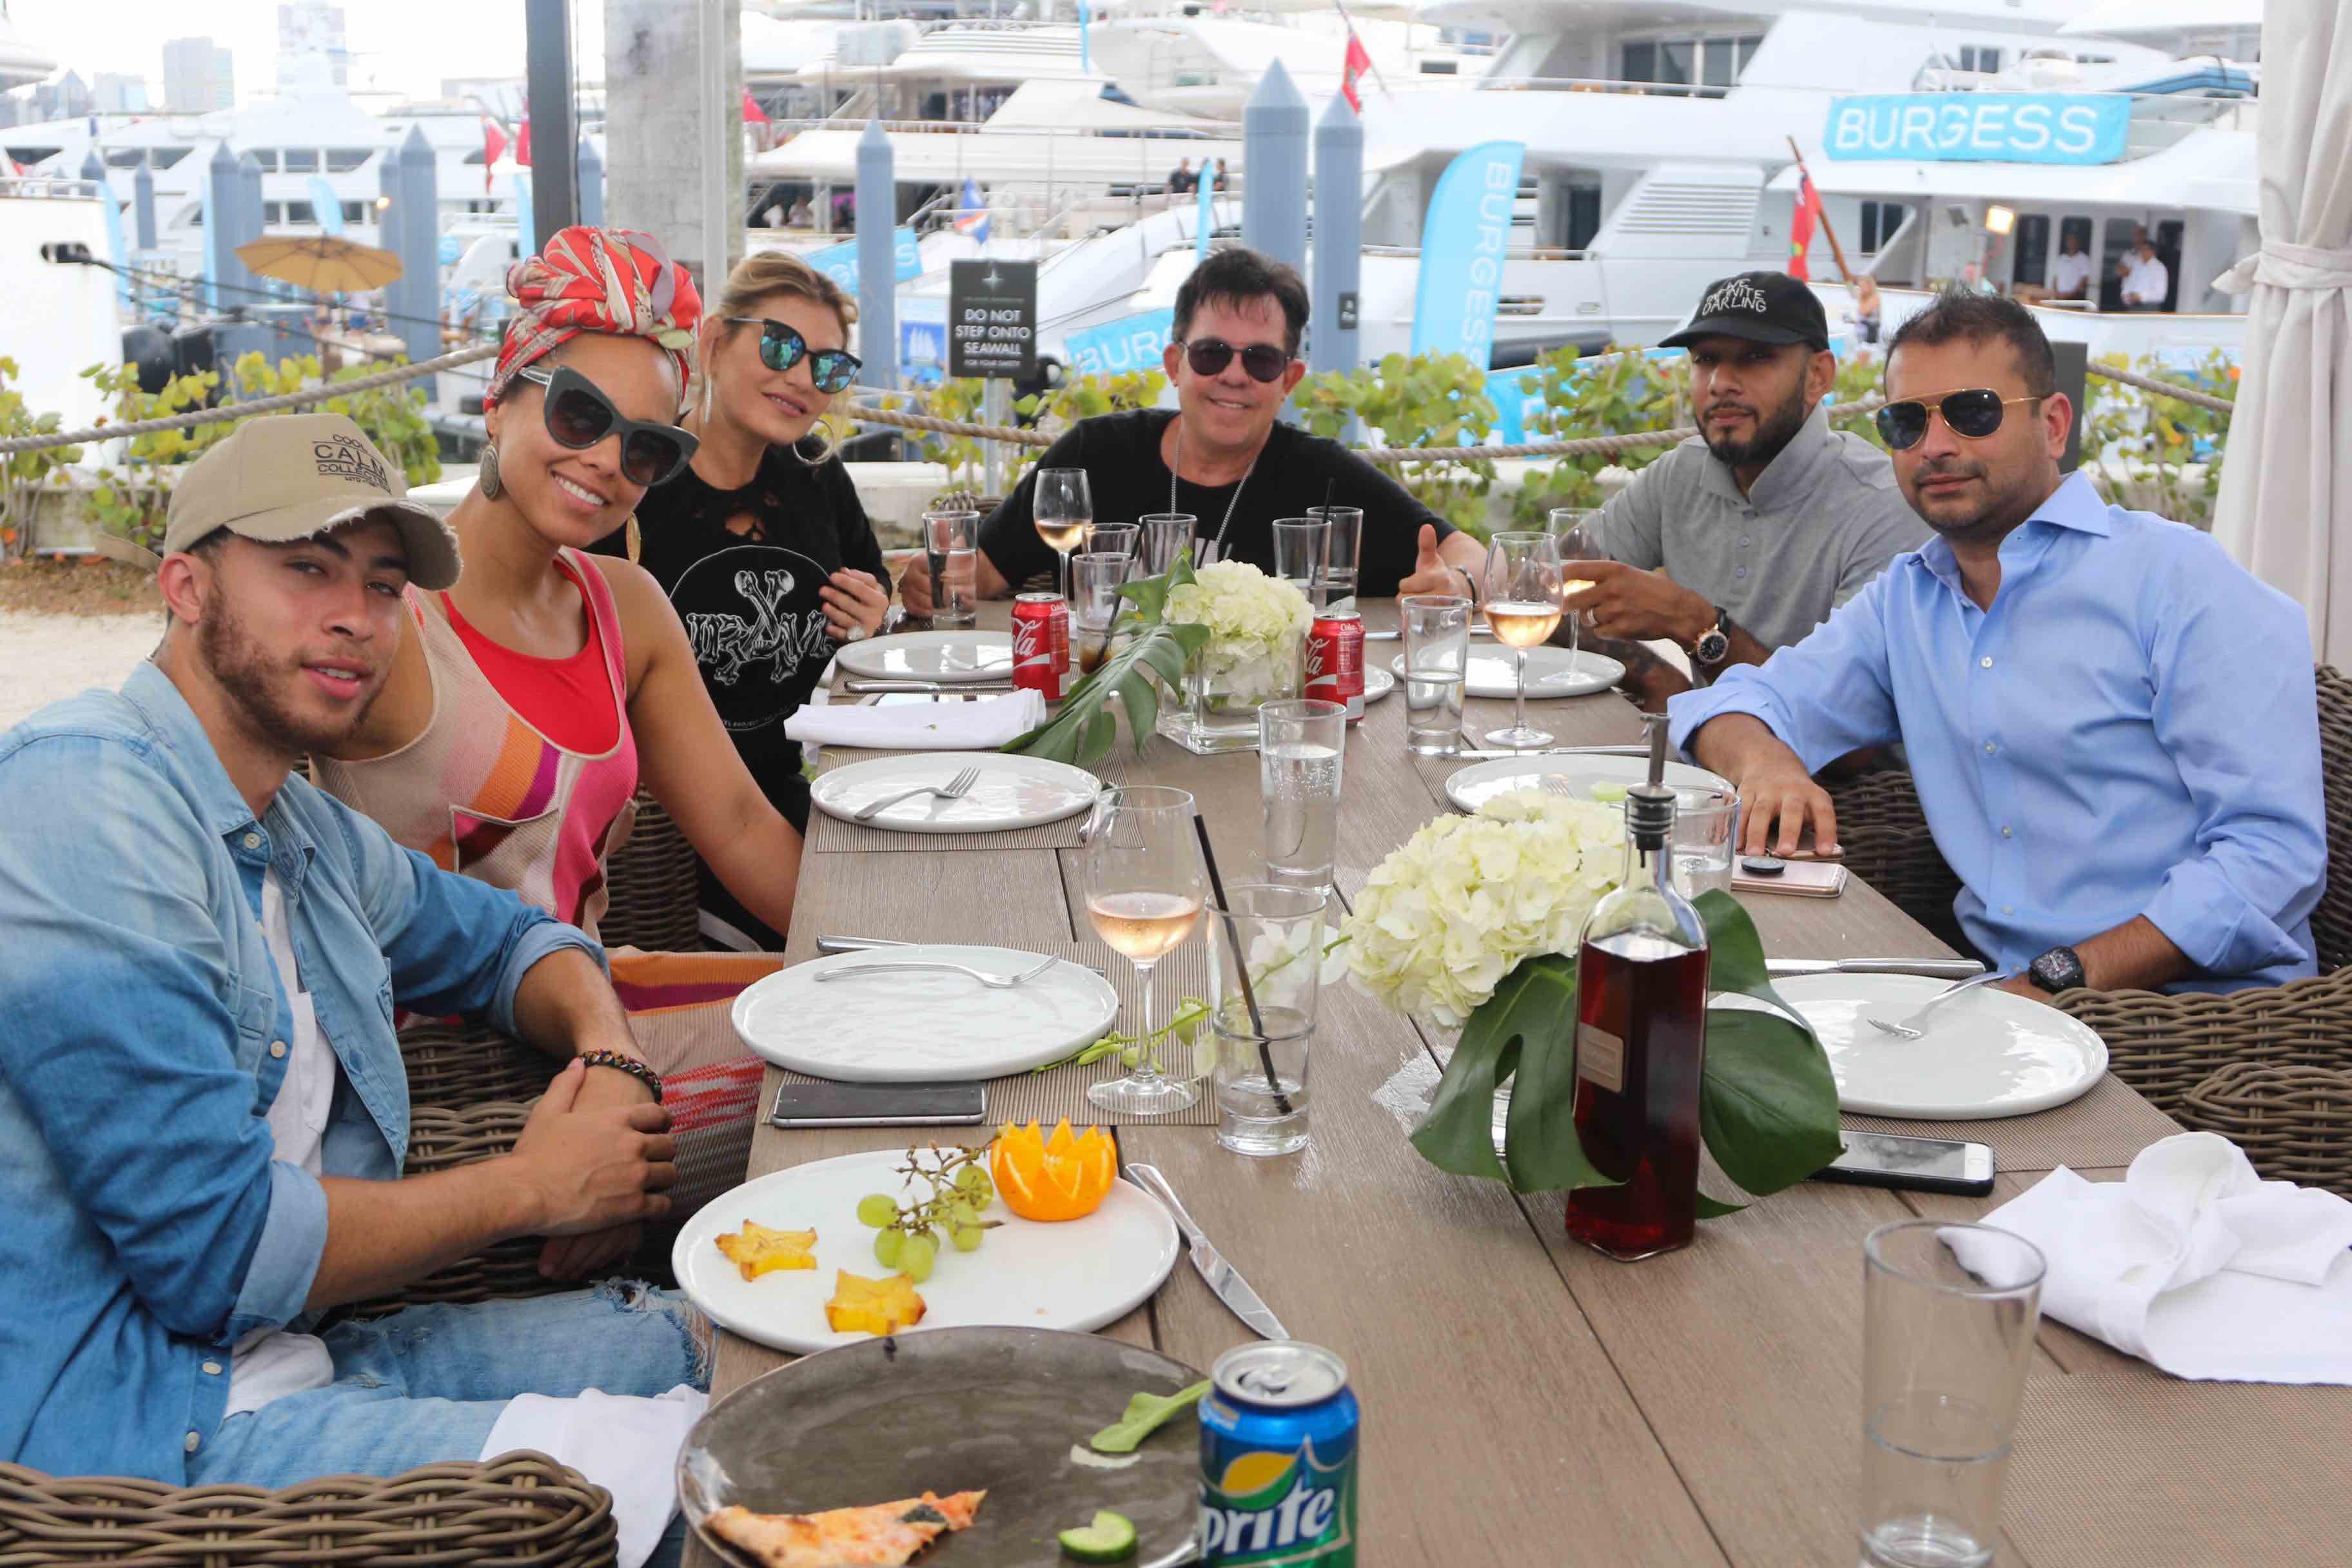 Cole Cook, Alicia Keys, Loren Ridinger, JR Ridinger, Swizz Beats and Kamal Hotchandani